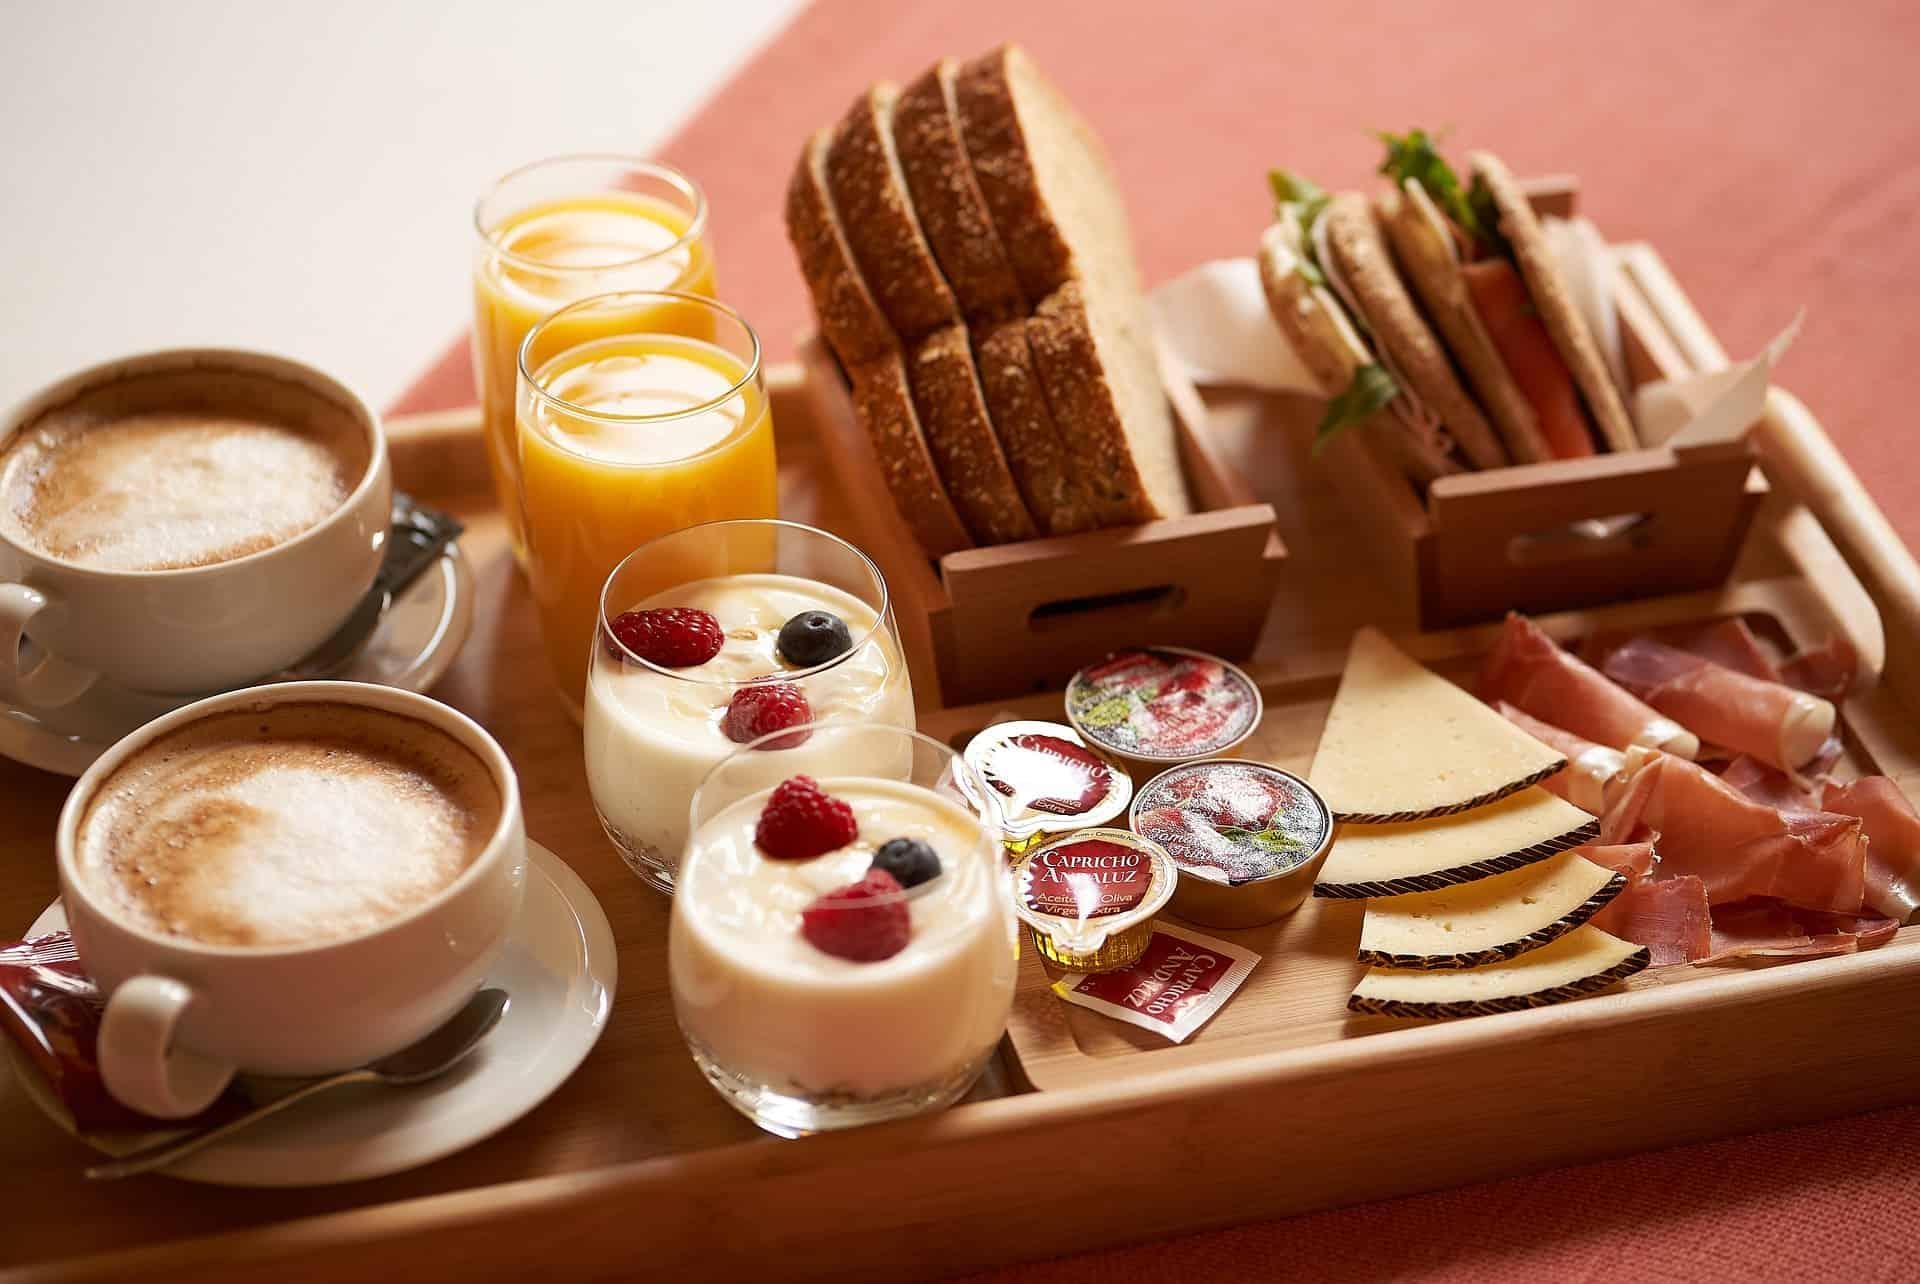 Desayuno inflamatorio